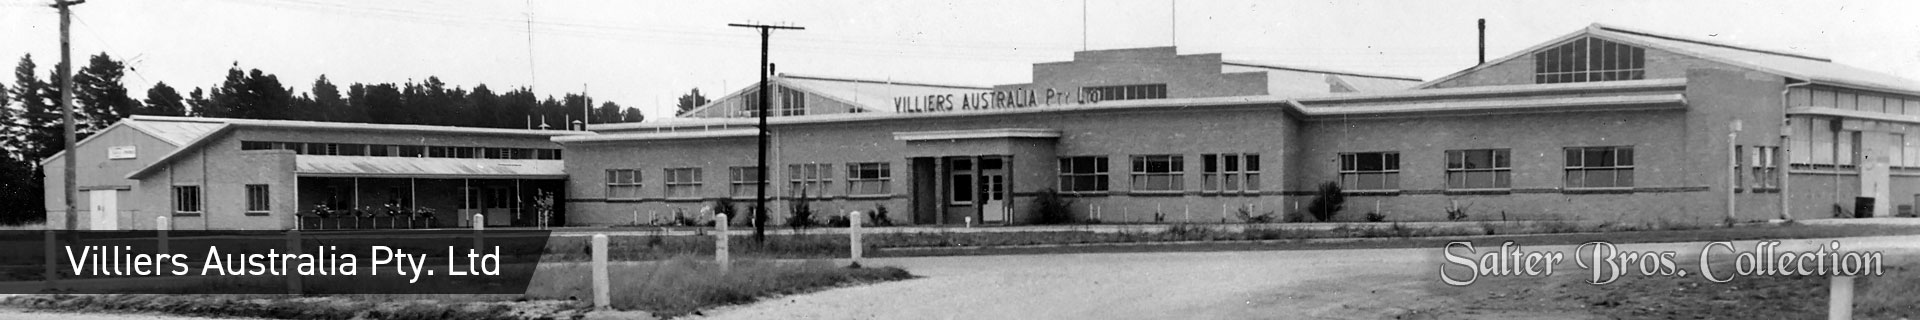 Villiers Australia - Salter Bros. Collection